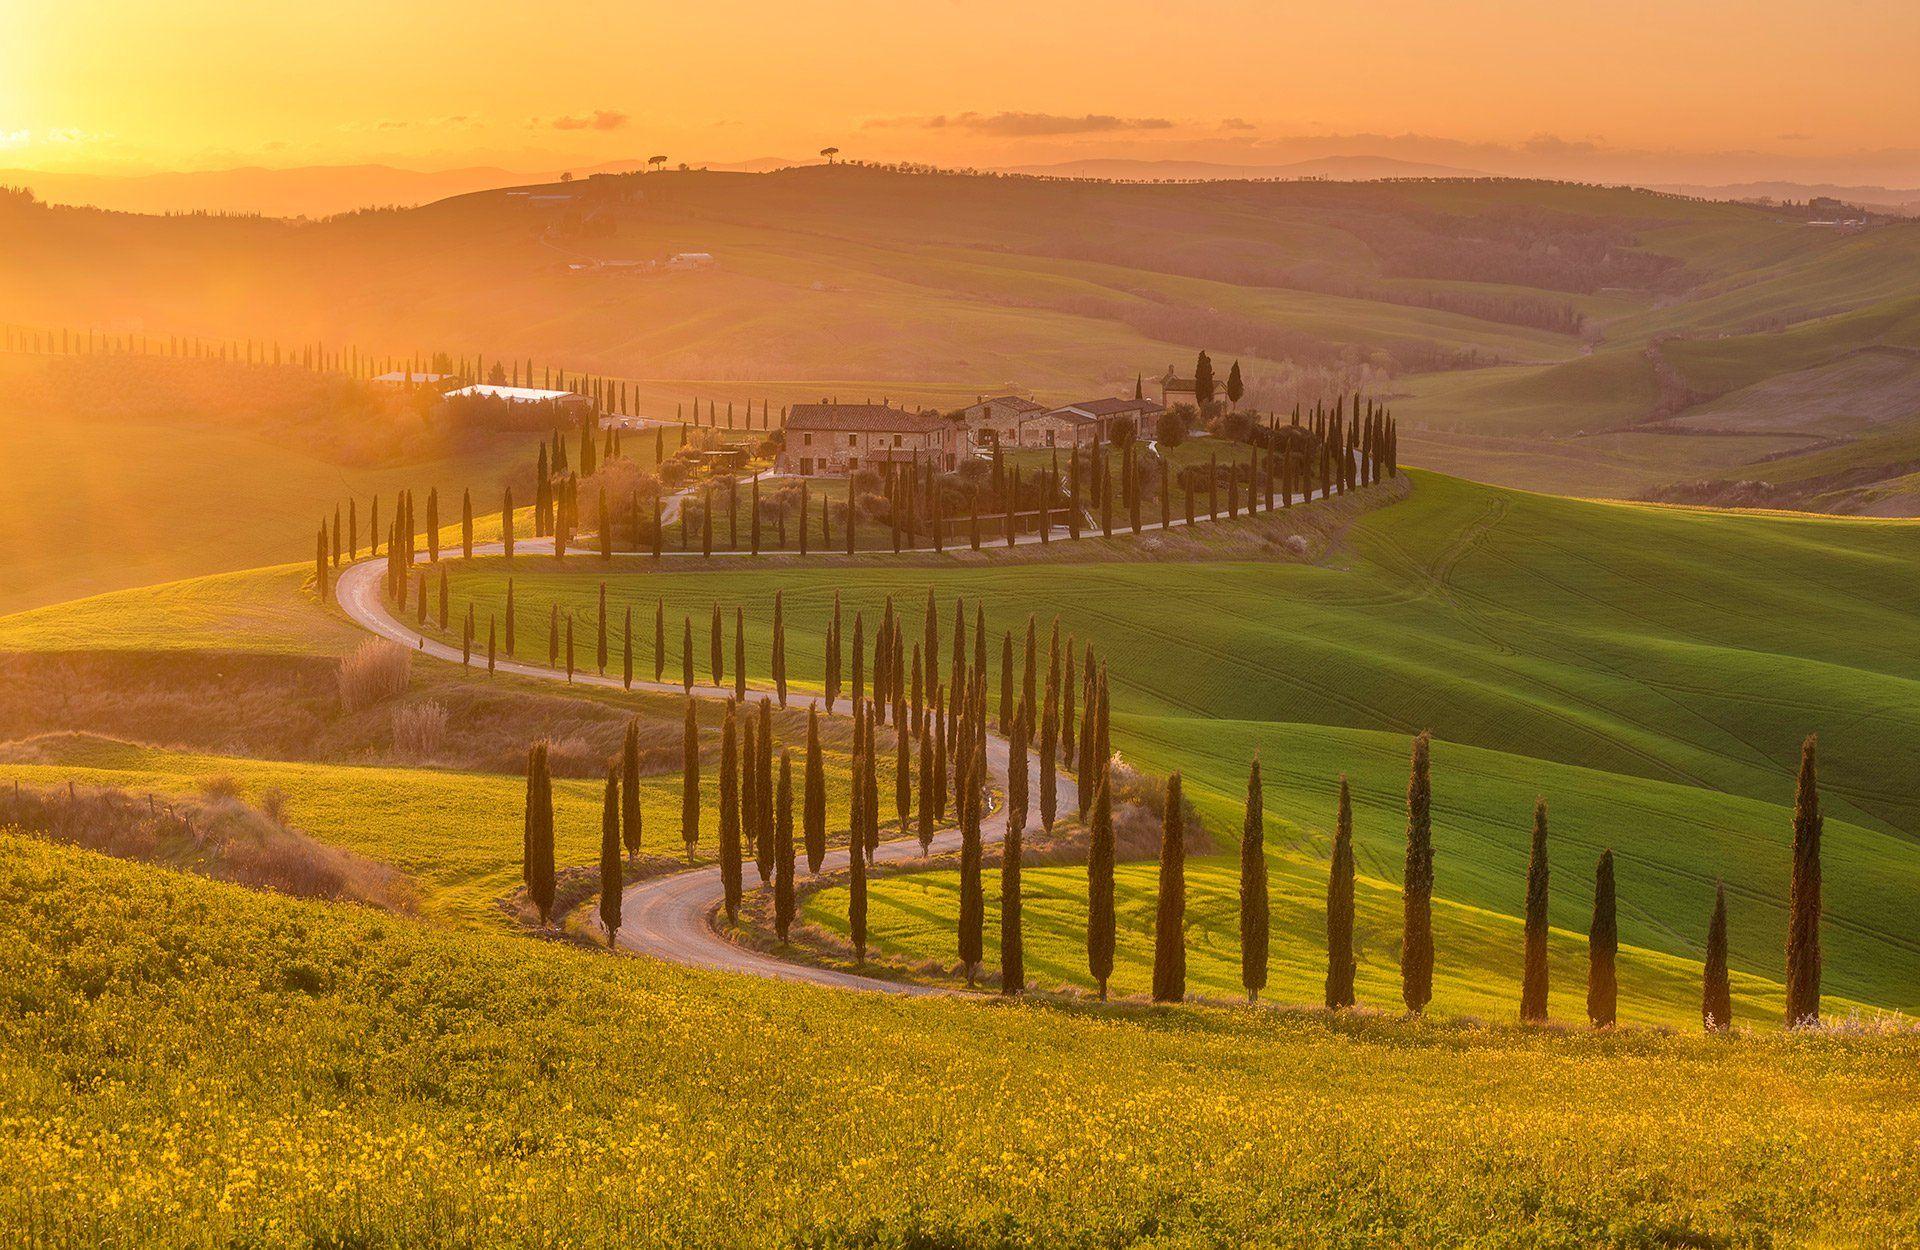 Tuscany, Crete Senesi, Italy, sunset, golden hour, Тоскана, cypress, Andrey Trifonov